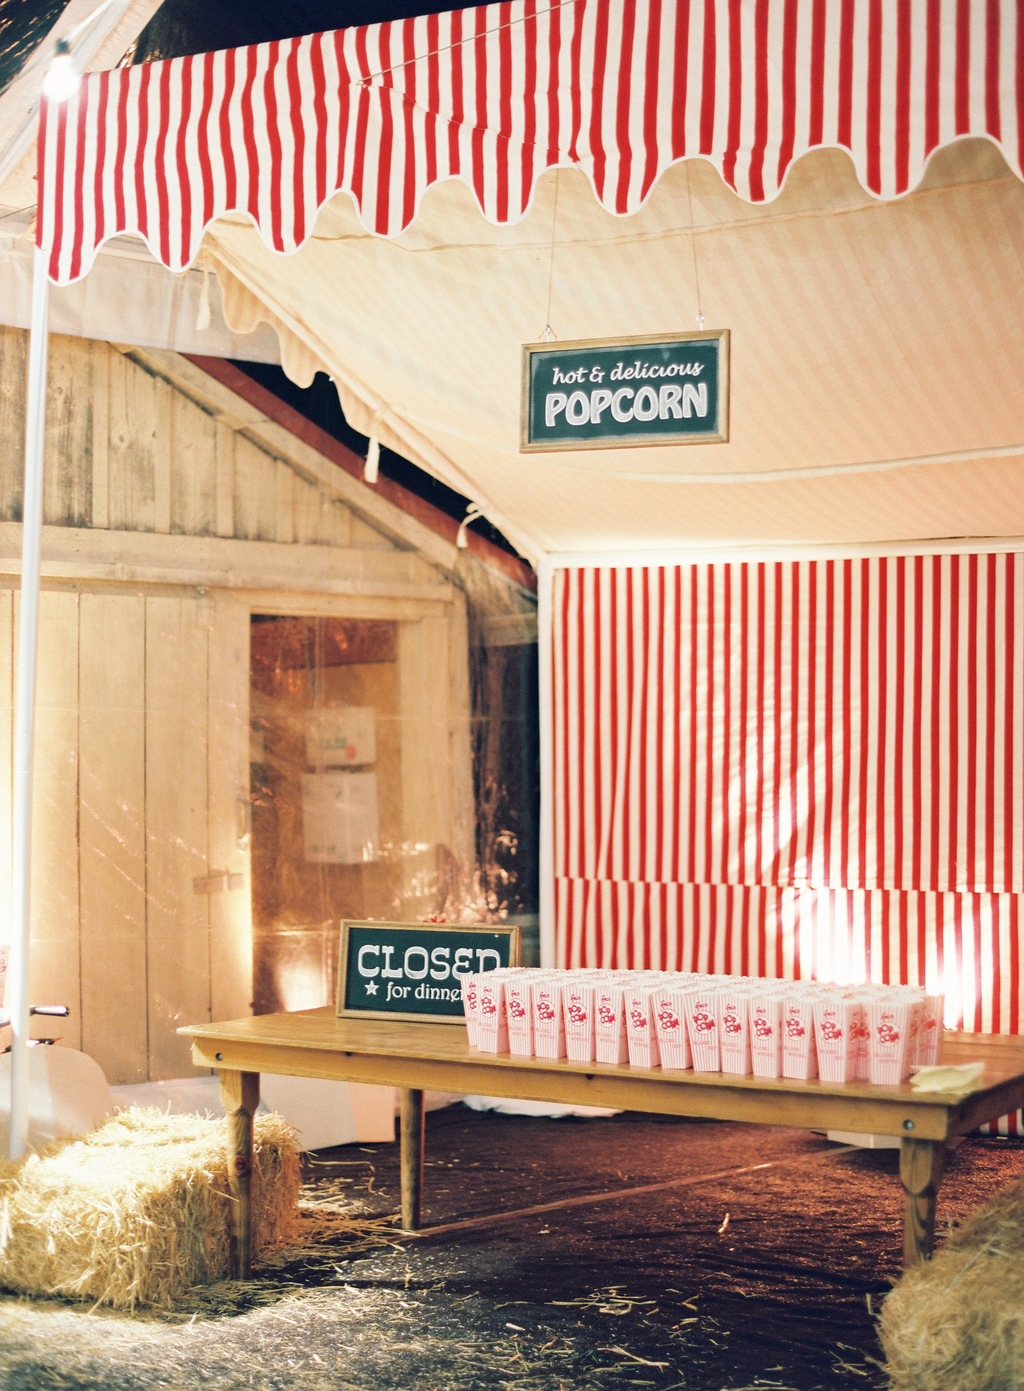 Wedding-santa-barbara-chic-outdoor-barn-circus-fair-food-jose-villa-unique-wedding-appetizers-popcorn-station-9.full